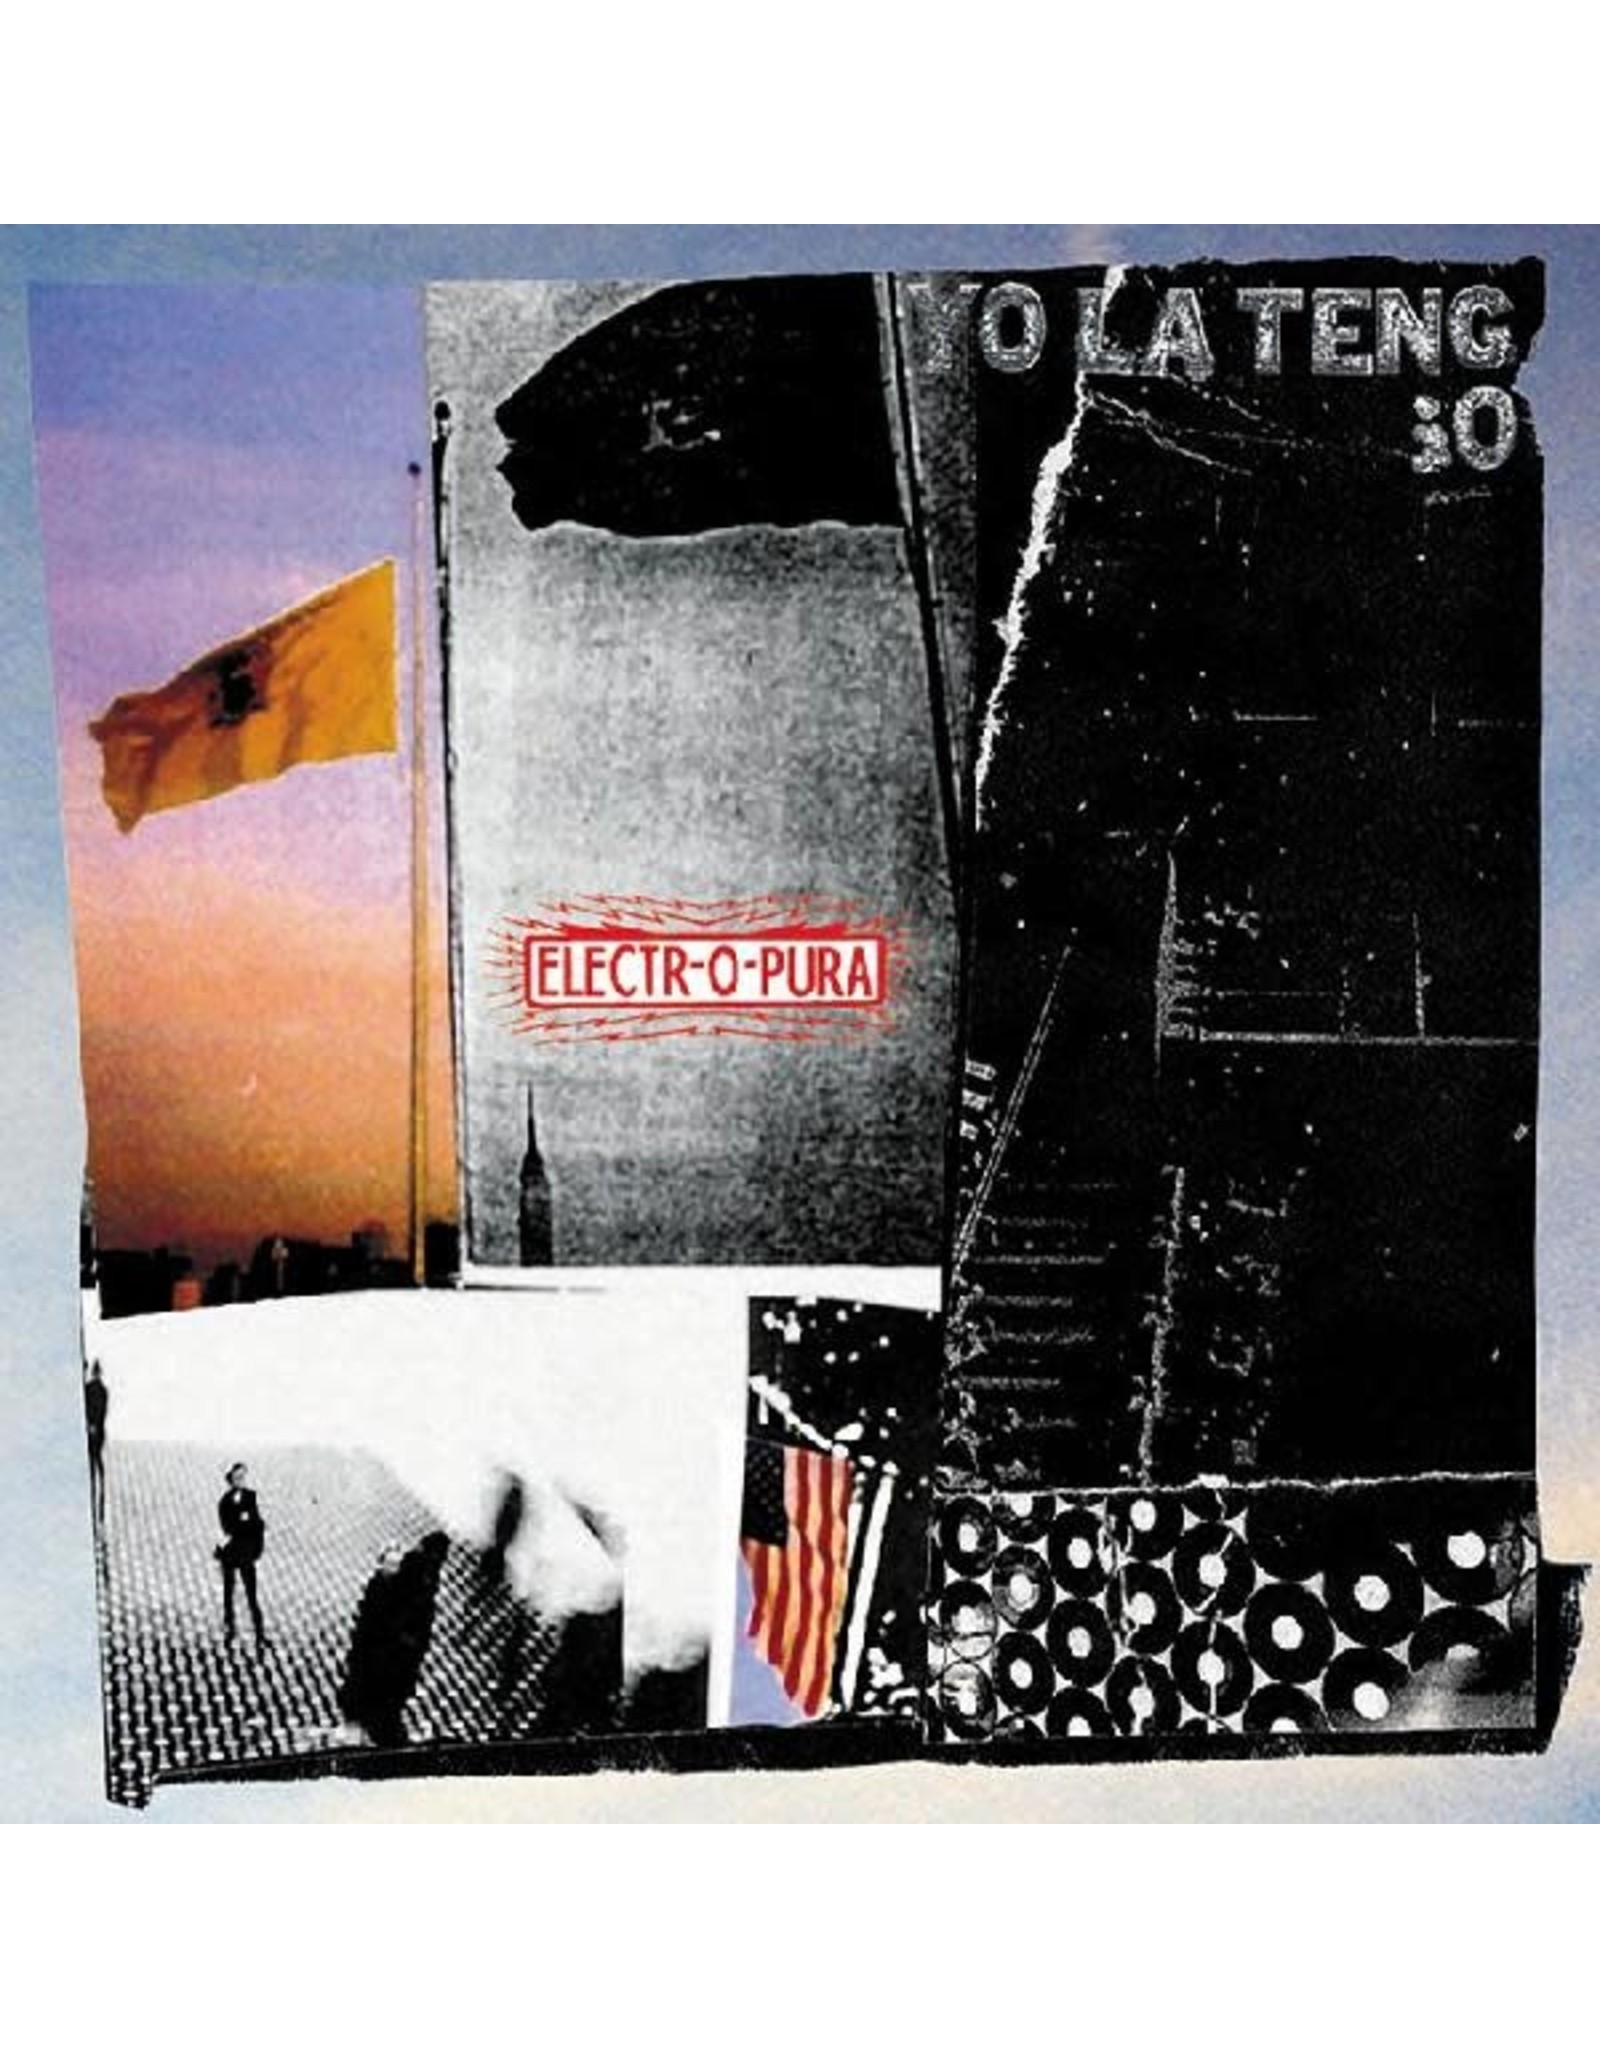 New Vinyl Yo La Tengo - Electr-O-Pura 2LP